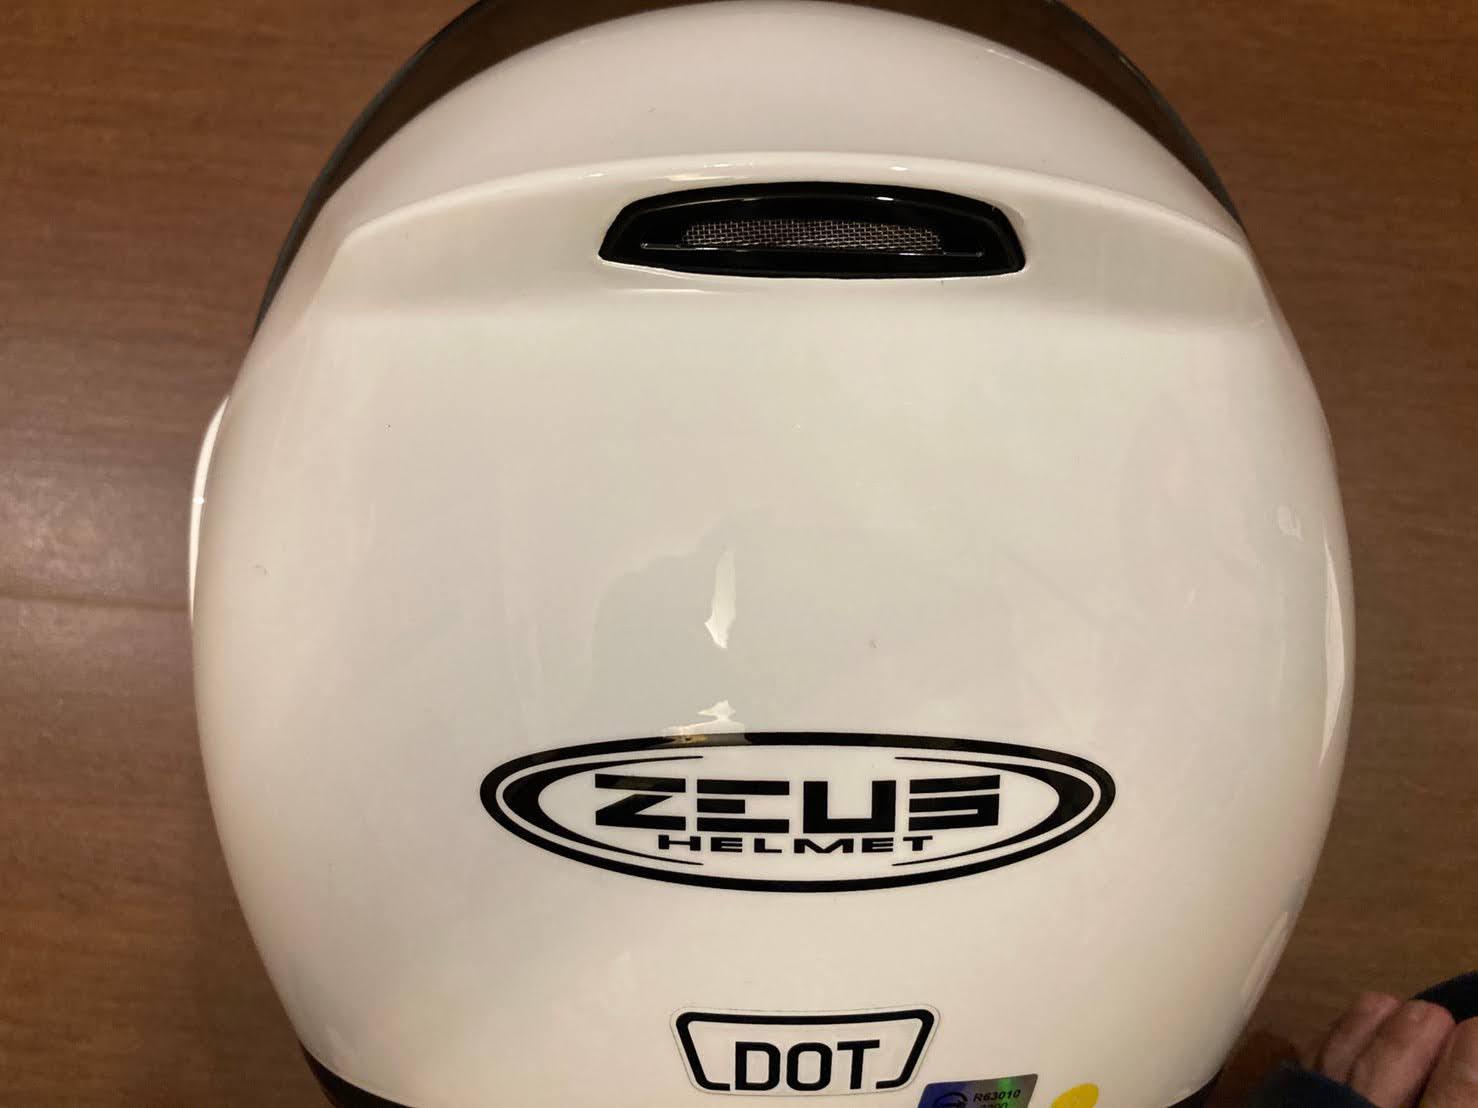 ZS-3300